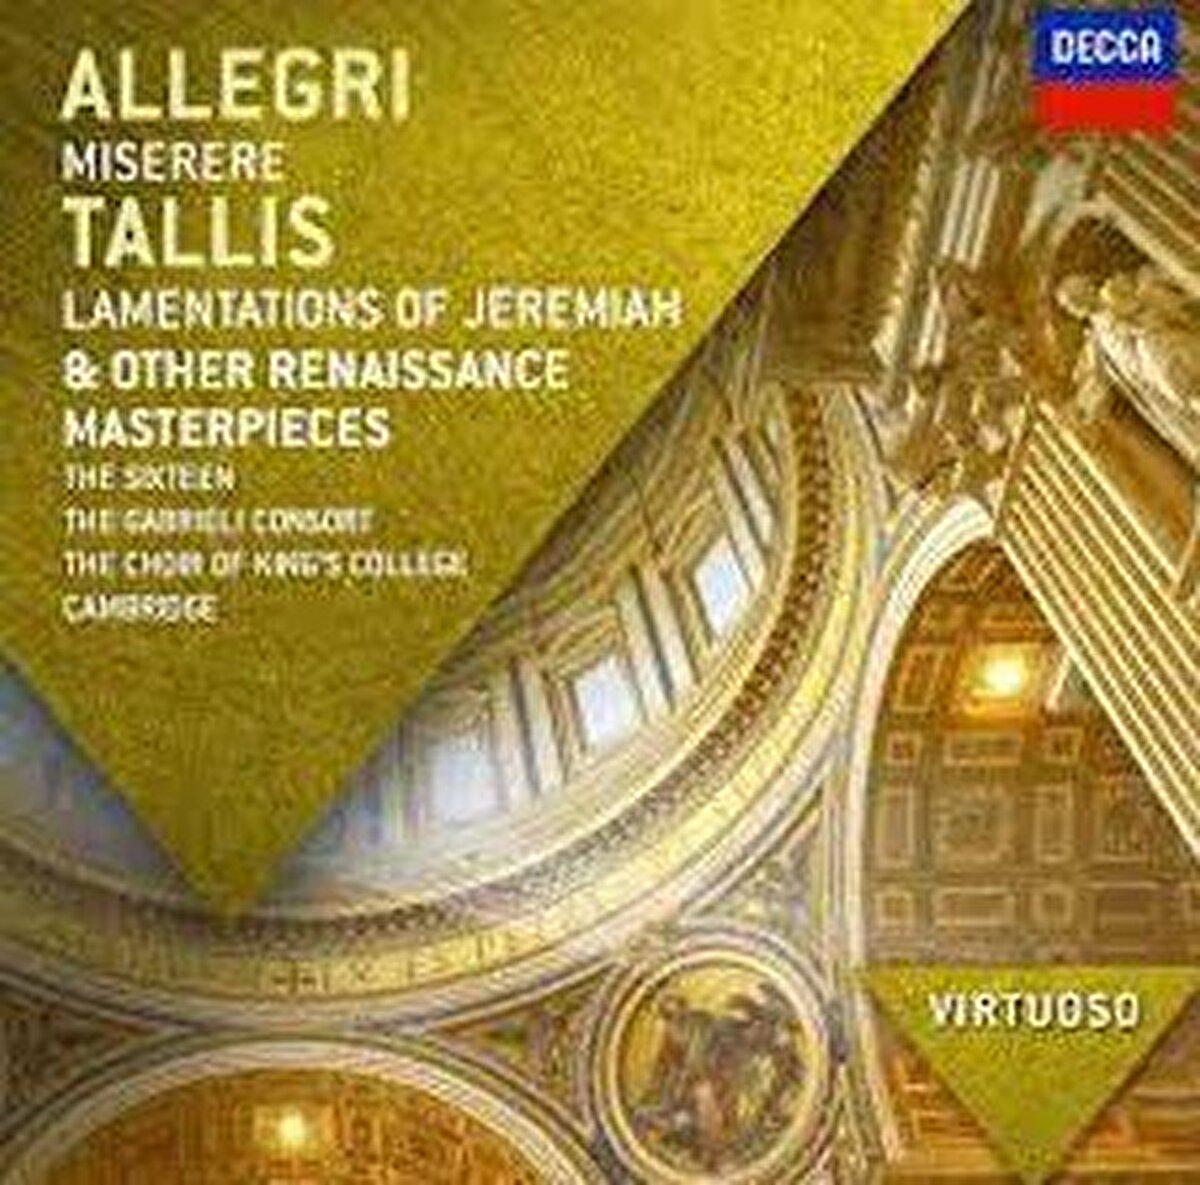 Allegri Miserere - Tallis Lamentations of Jeremiah, Other Renaissance Masterpieces